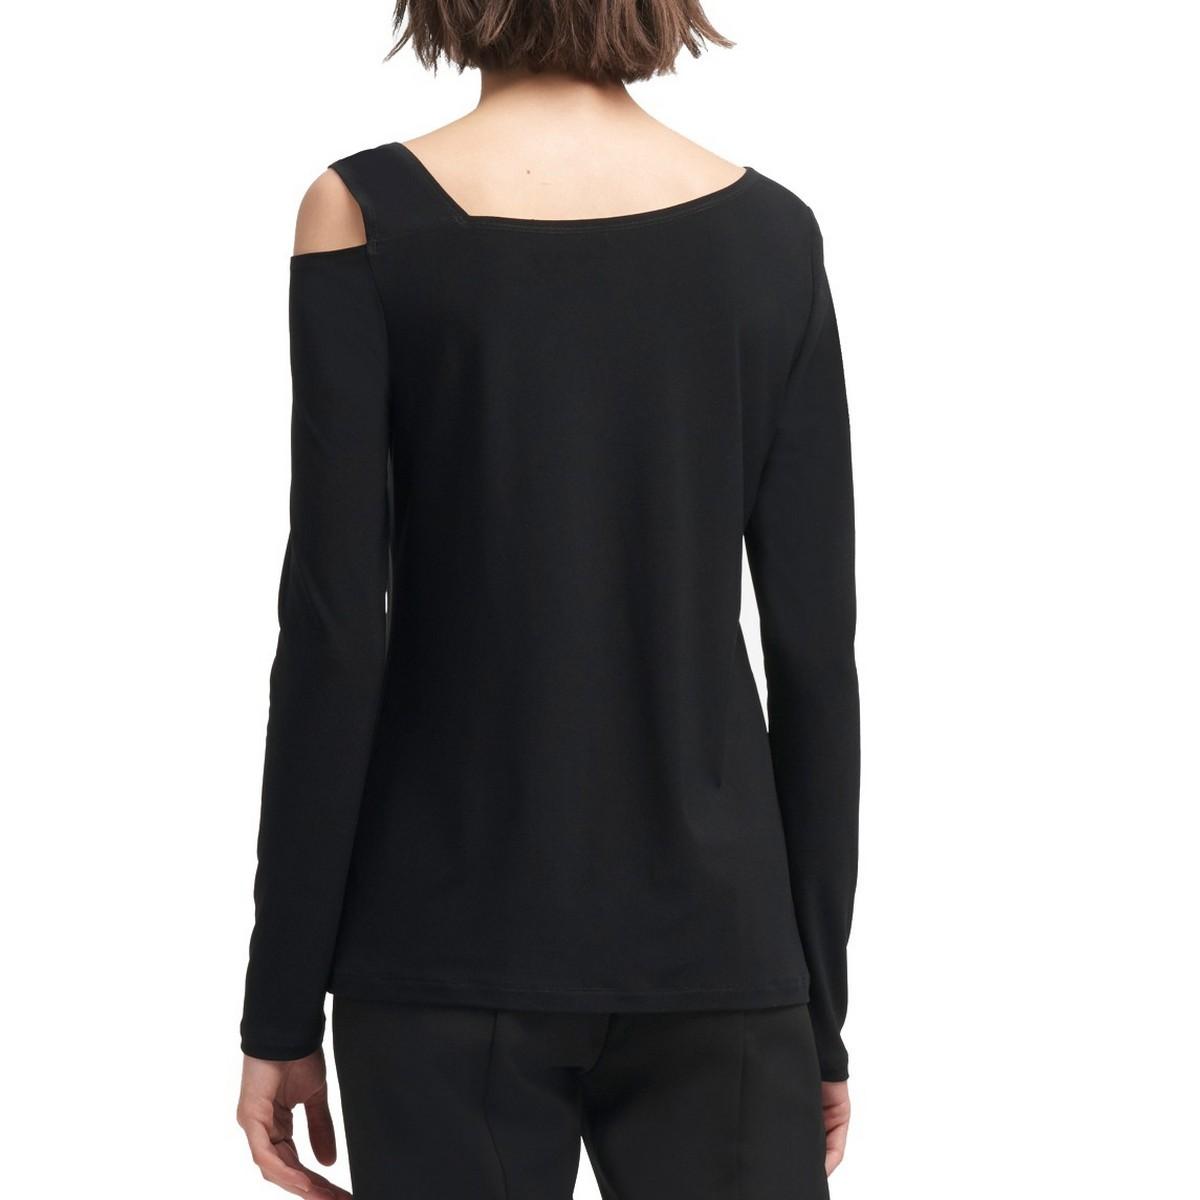 DKNY-NEW-Women-039-s-Asymmetrical-Cold-shoulder-Blouse-Shirt-Top-TEDO thumbnail 3